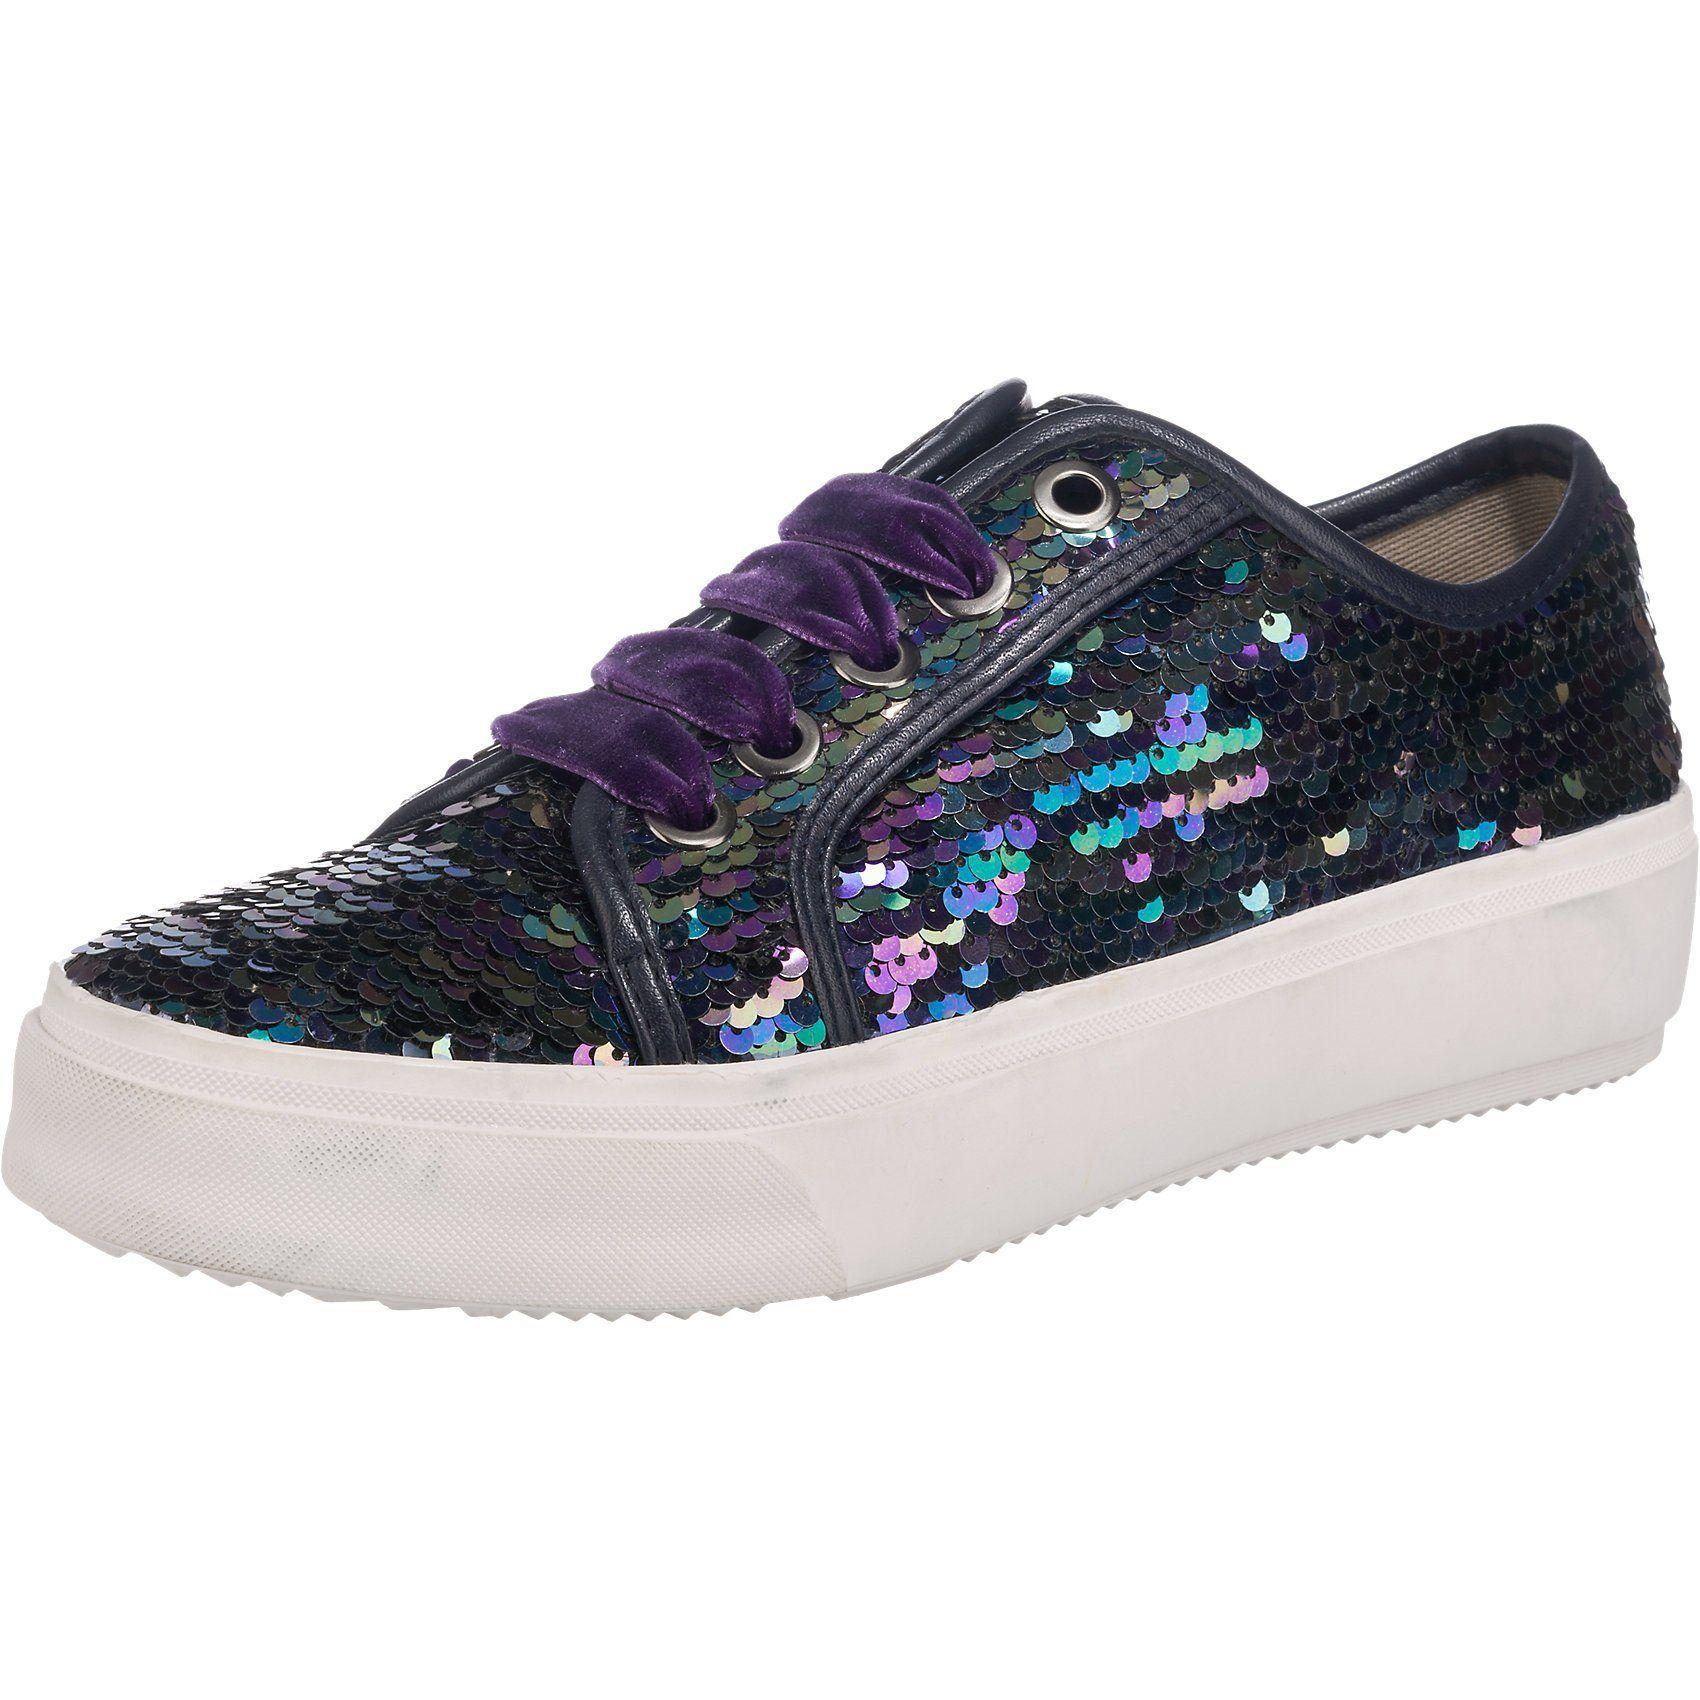 Damen Alma en Pena Sneakers bunt, mehrfarbig   00001723610002 online ... 4bdf3d32d1